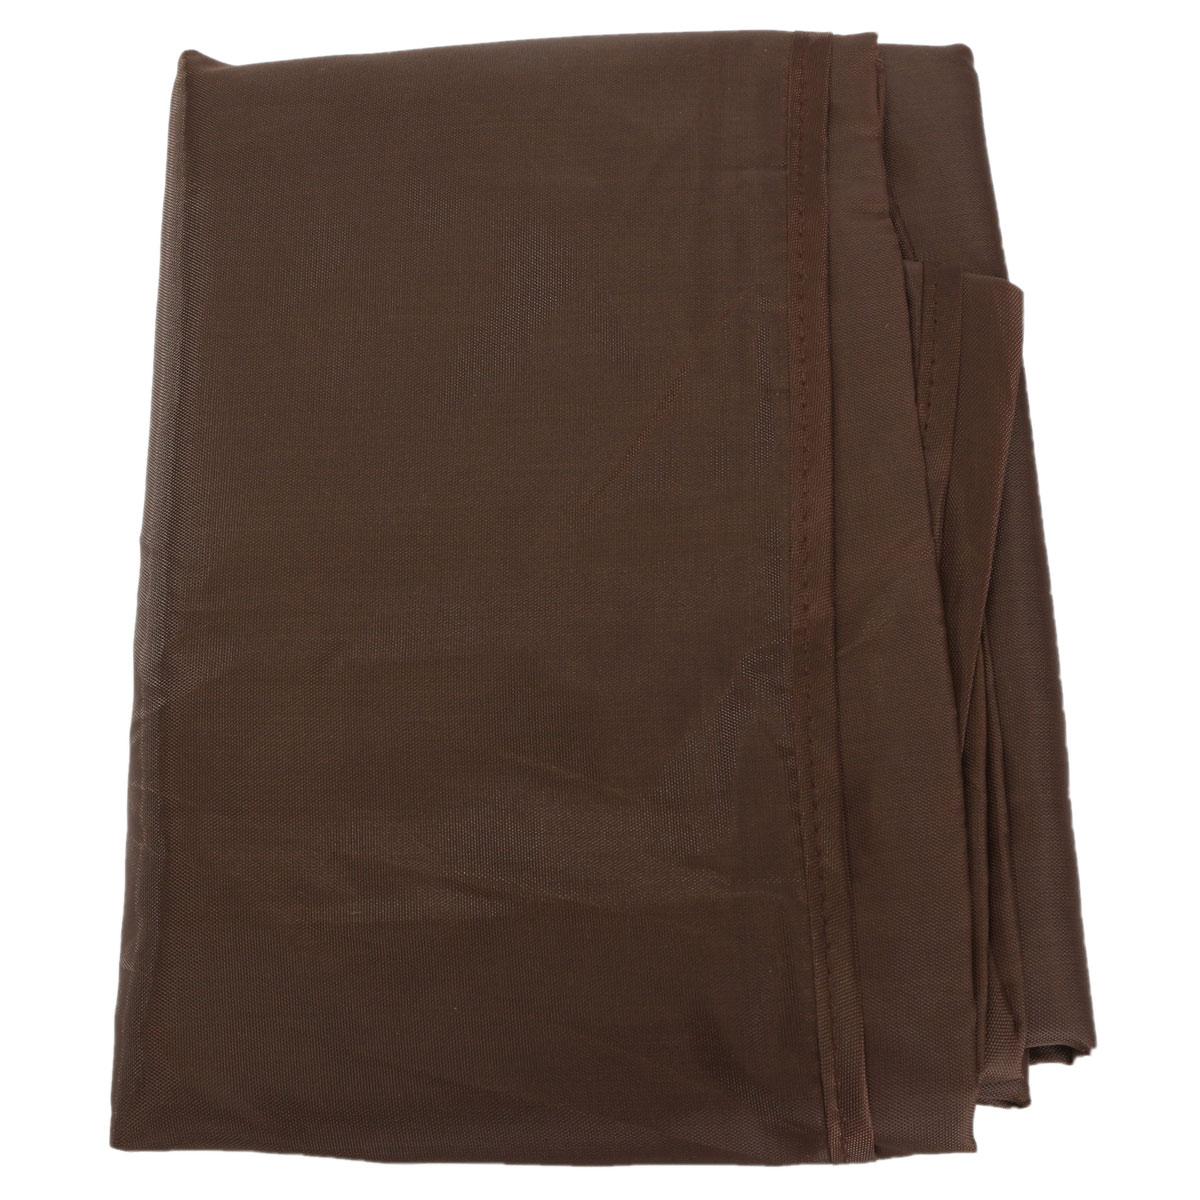 Neufu housse rangement v tement sac etui antipoussi re protection manteau costume robe caf - Housse rangement vetement ...